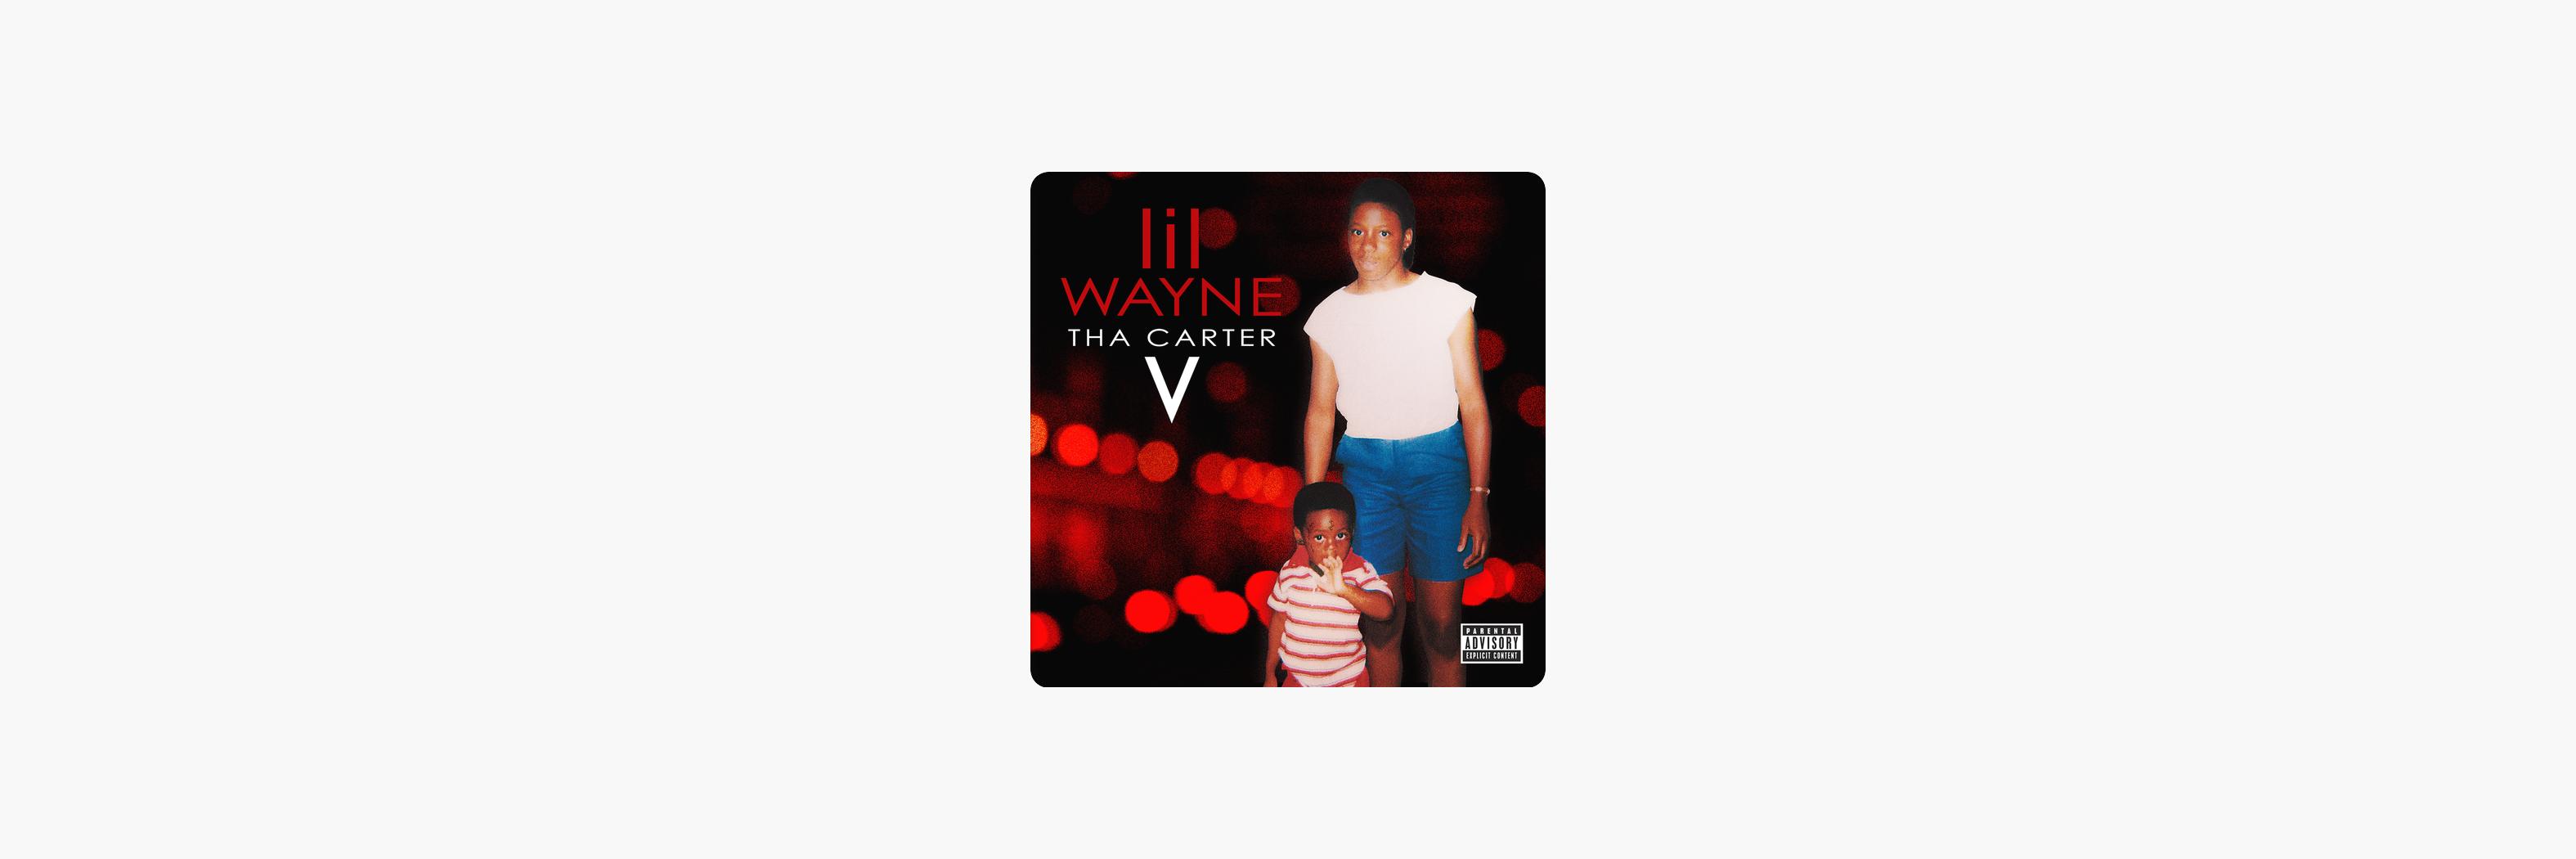 262a94ef8b19 Let It Fly (feat. Travis Scott) - Lil Wayne #applemusic | iTunes ...